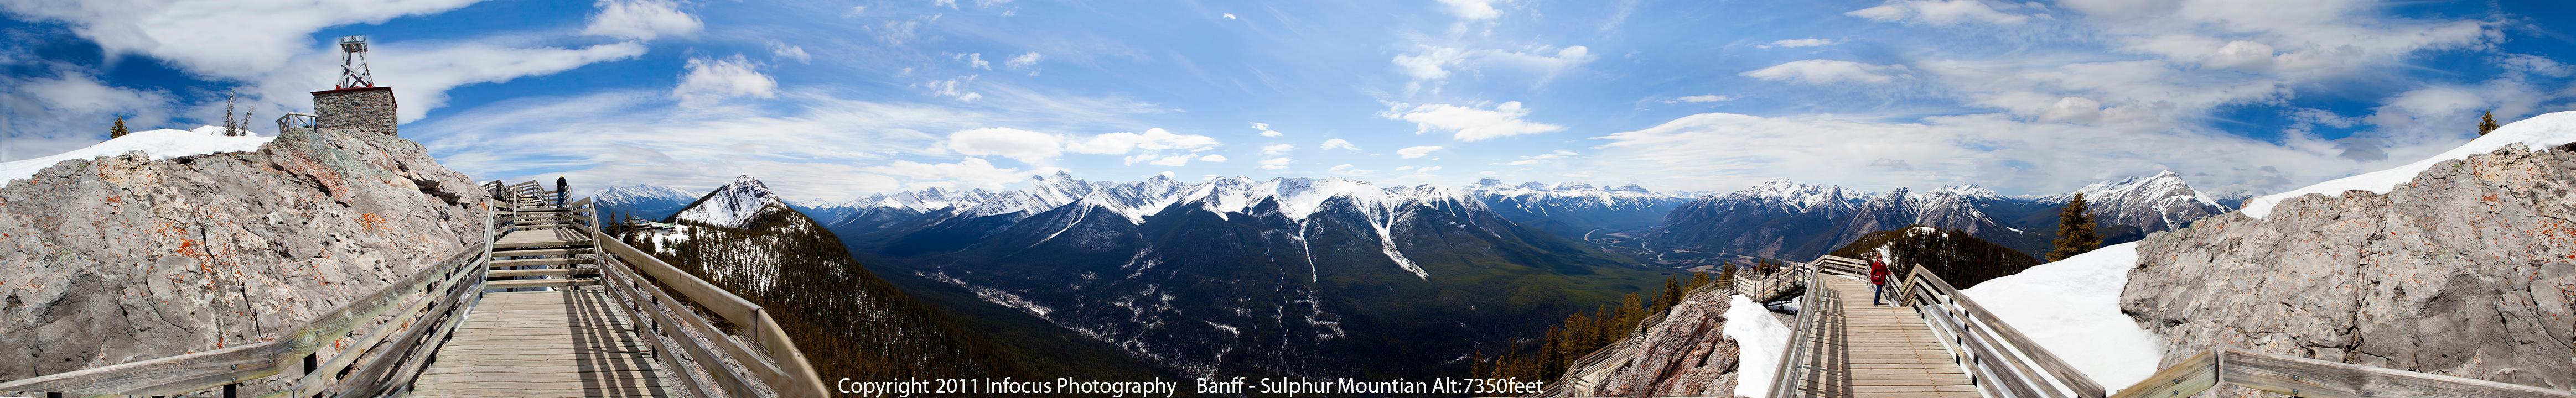 360 degree panoramic Banff, Alberta, Canada.  Sulphur Mountain Altitude: 7350 feet